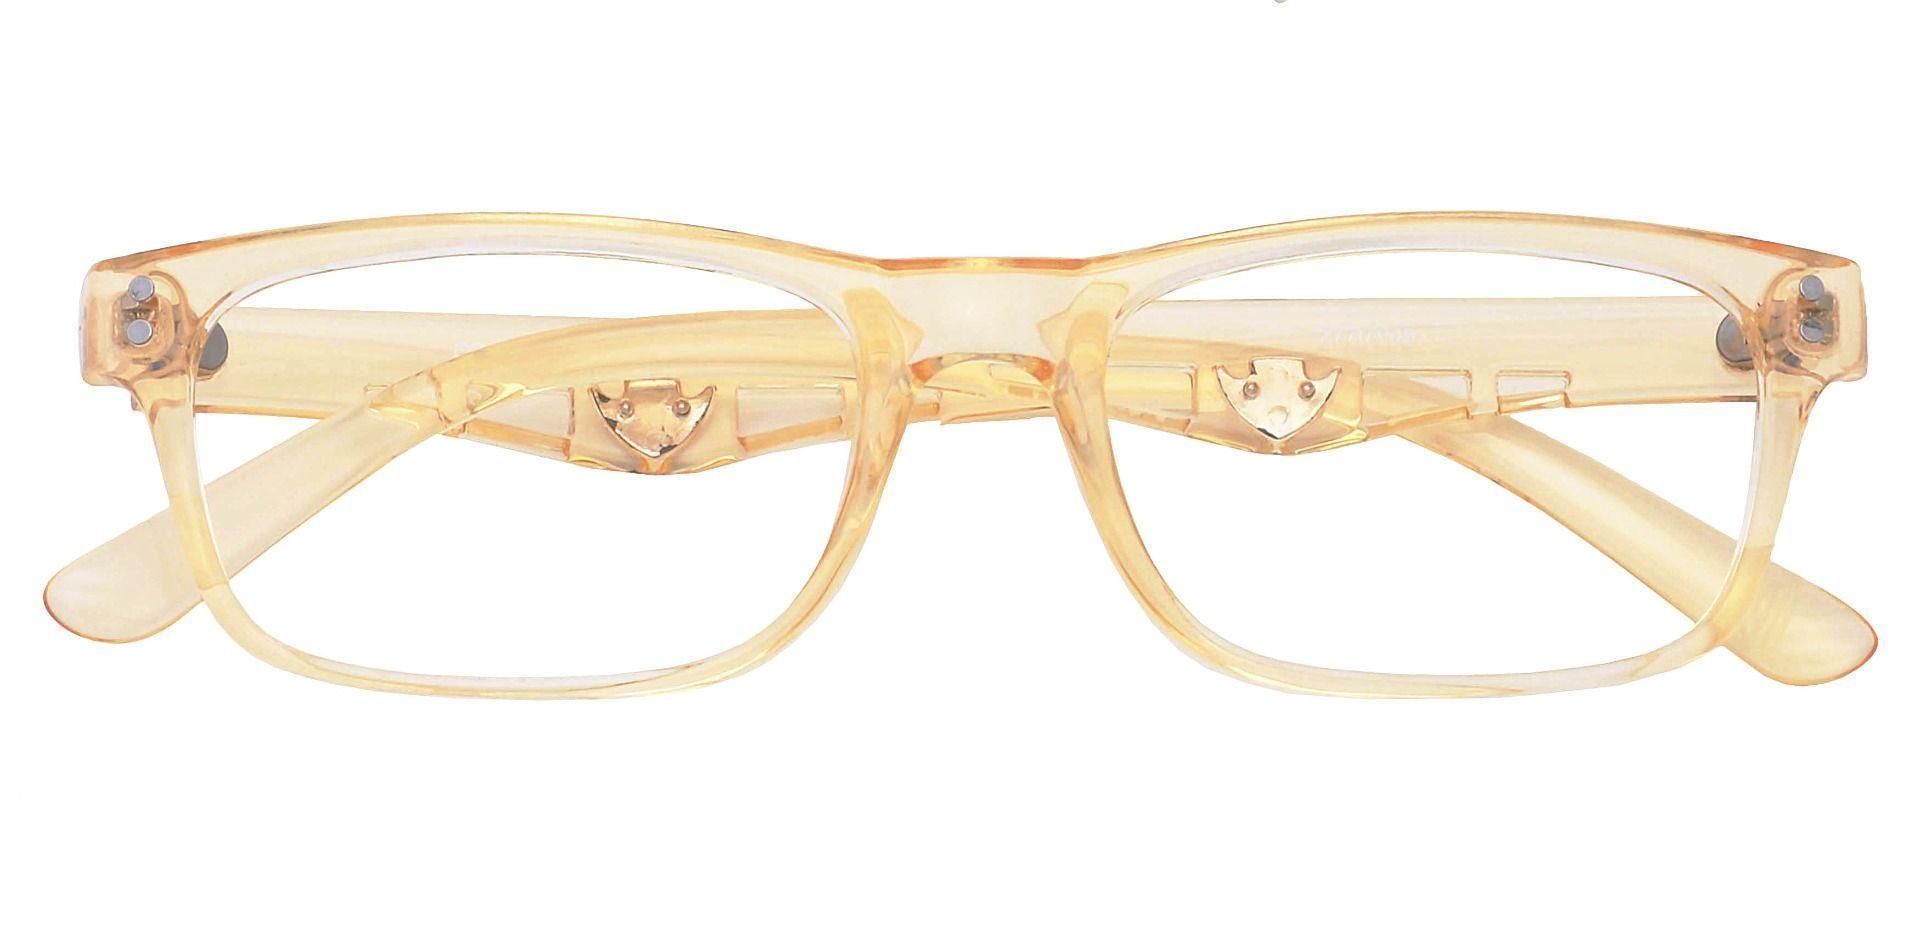 Aura Rectangle Eyeglasses Frame - Yellow